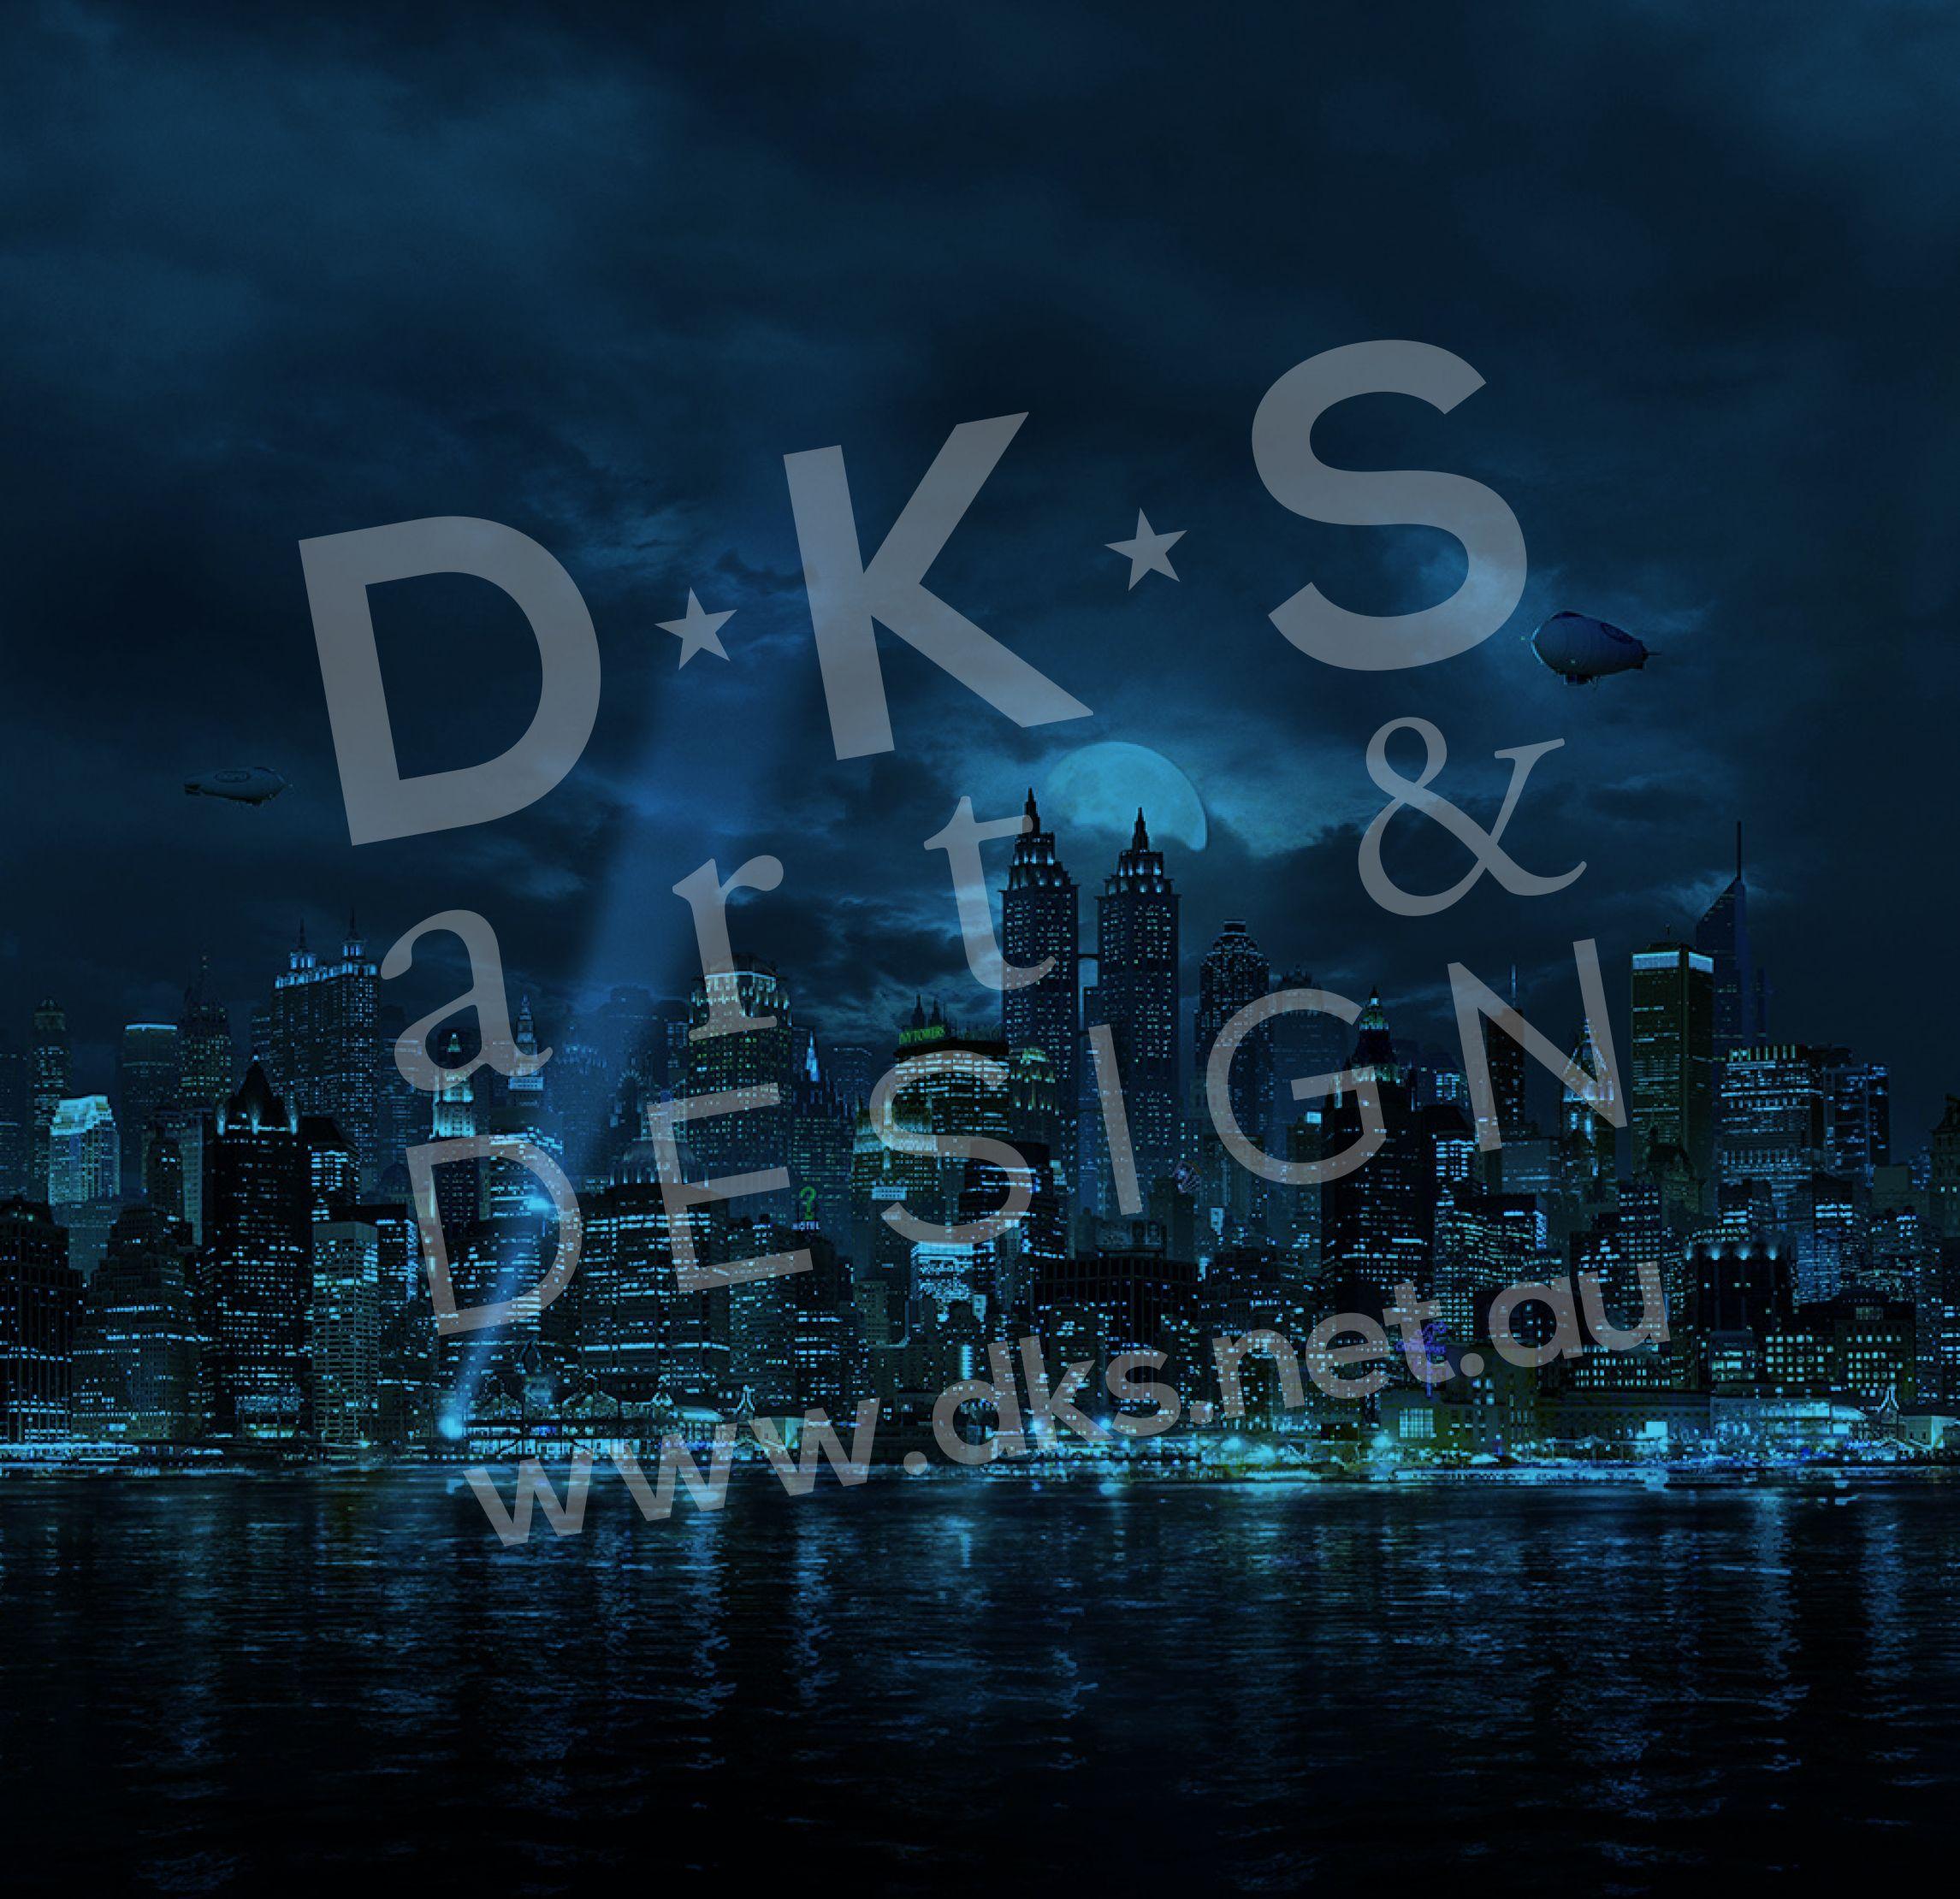 Batman Gotham City Background Design 3 For Detolf Display Cabinet. #Batman  #GothamCity #Detolf #DKSartDesign